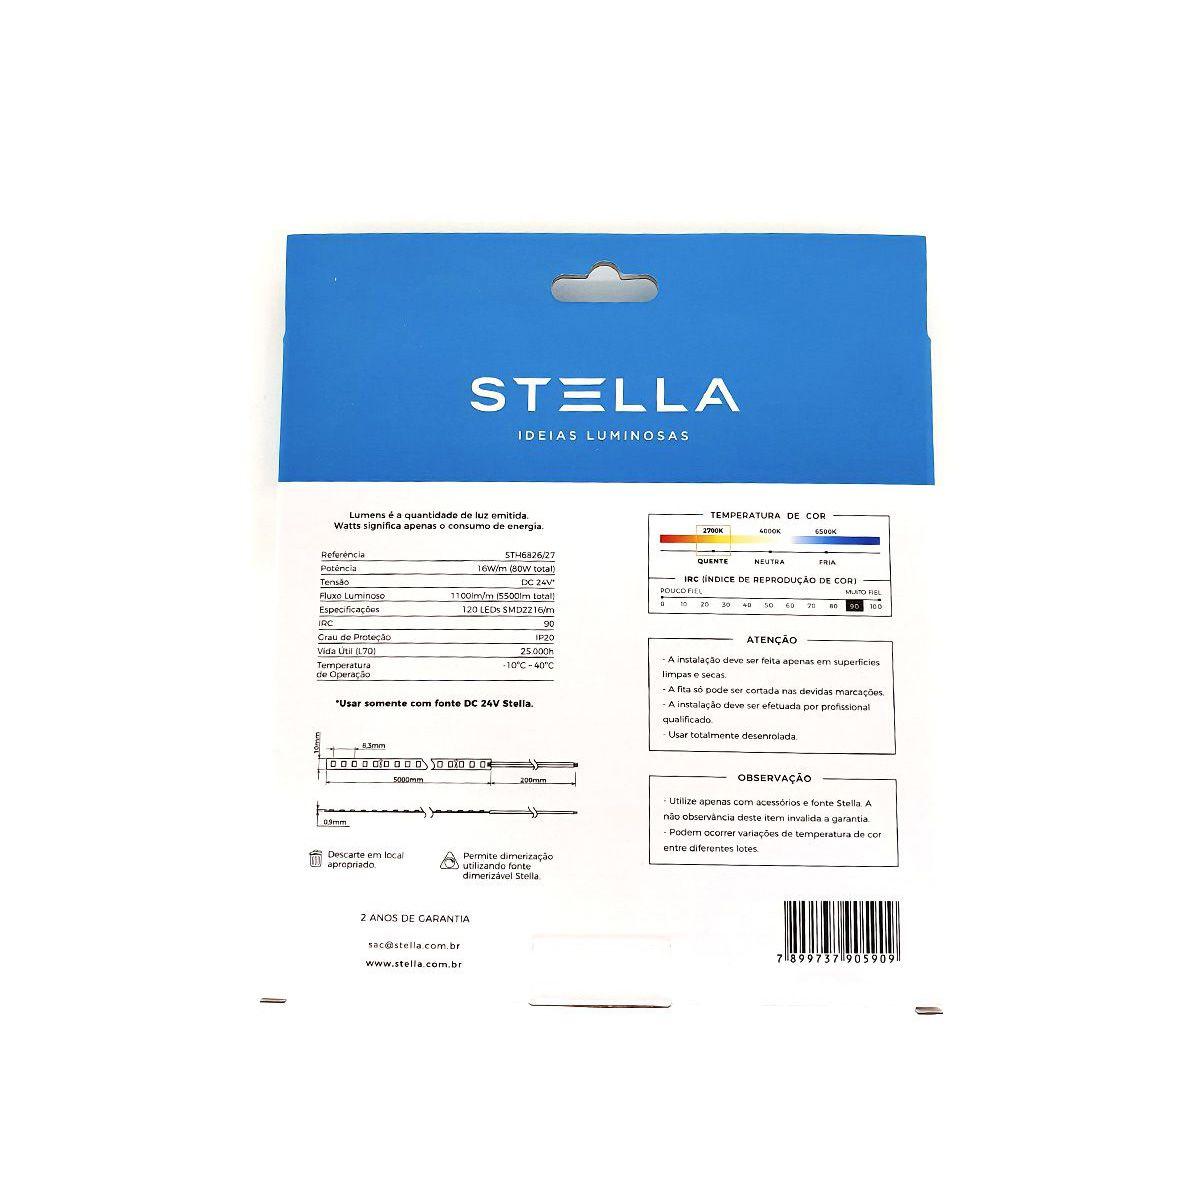 Fita LED Profissional 16W/M 2700K IP20 24V IRC90 1100lm-5m - Stella-STH6826/27